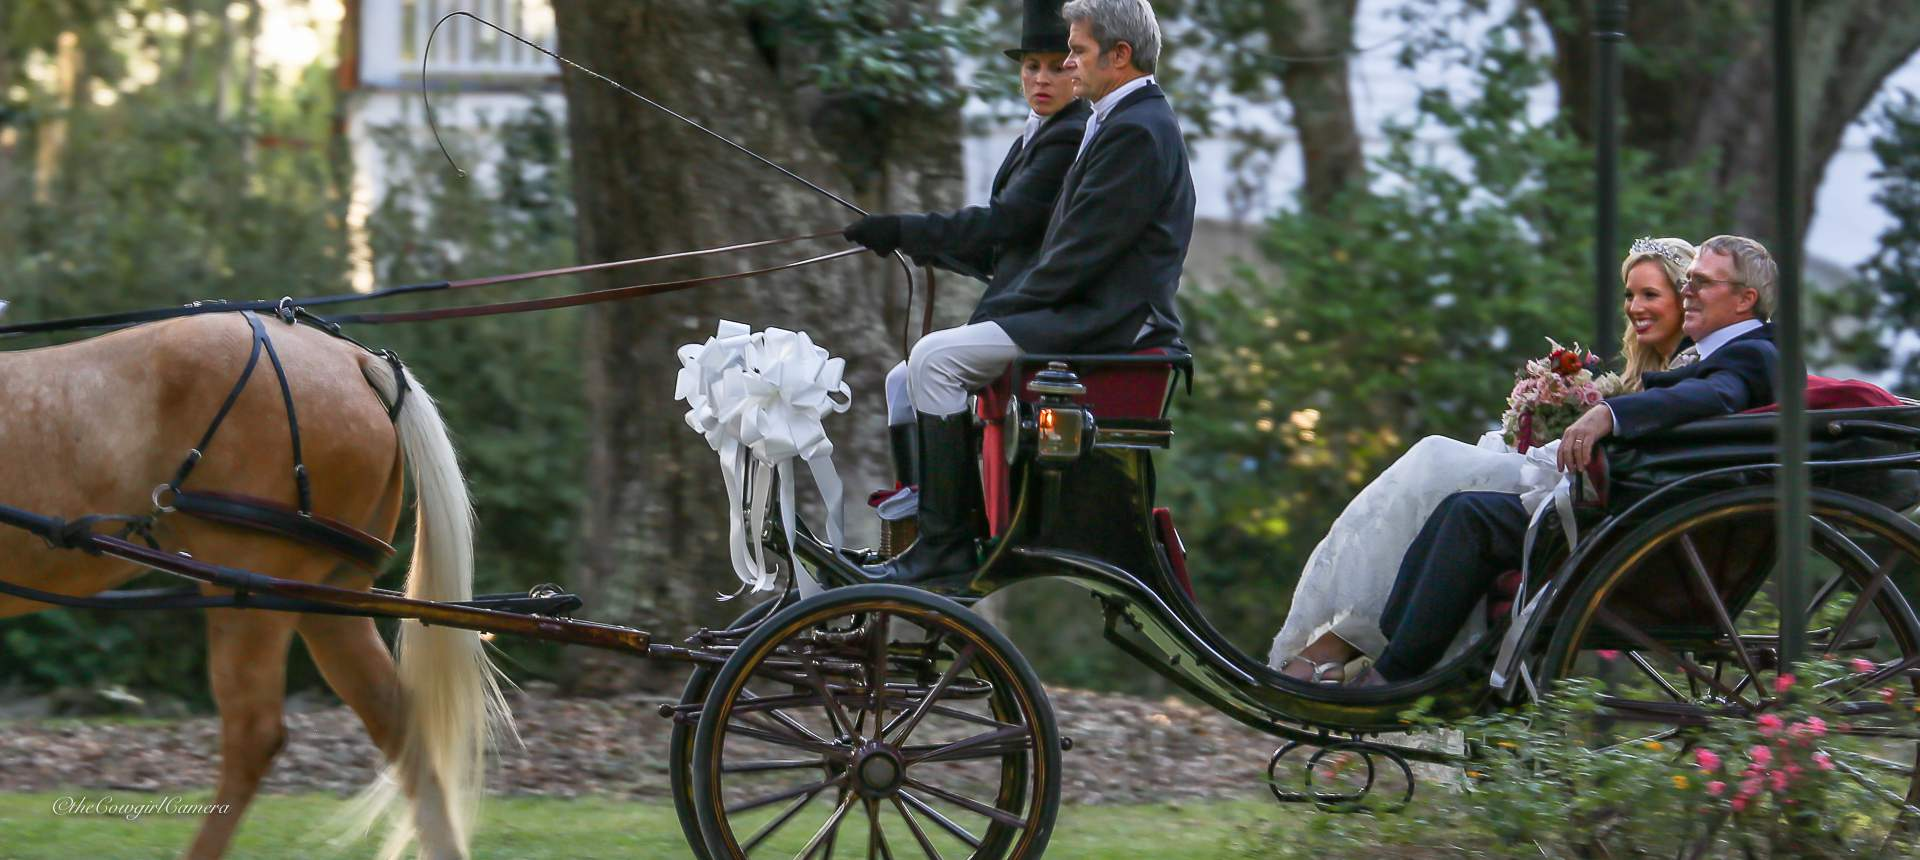 The Cowgirl Camera - Morrison, Colorado Wedding Photographer